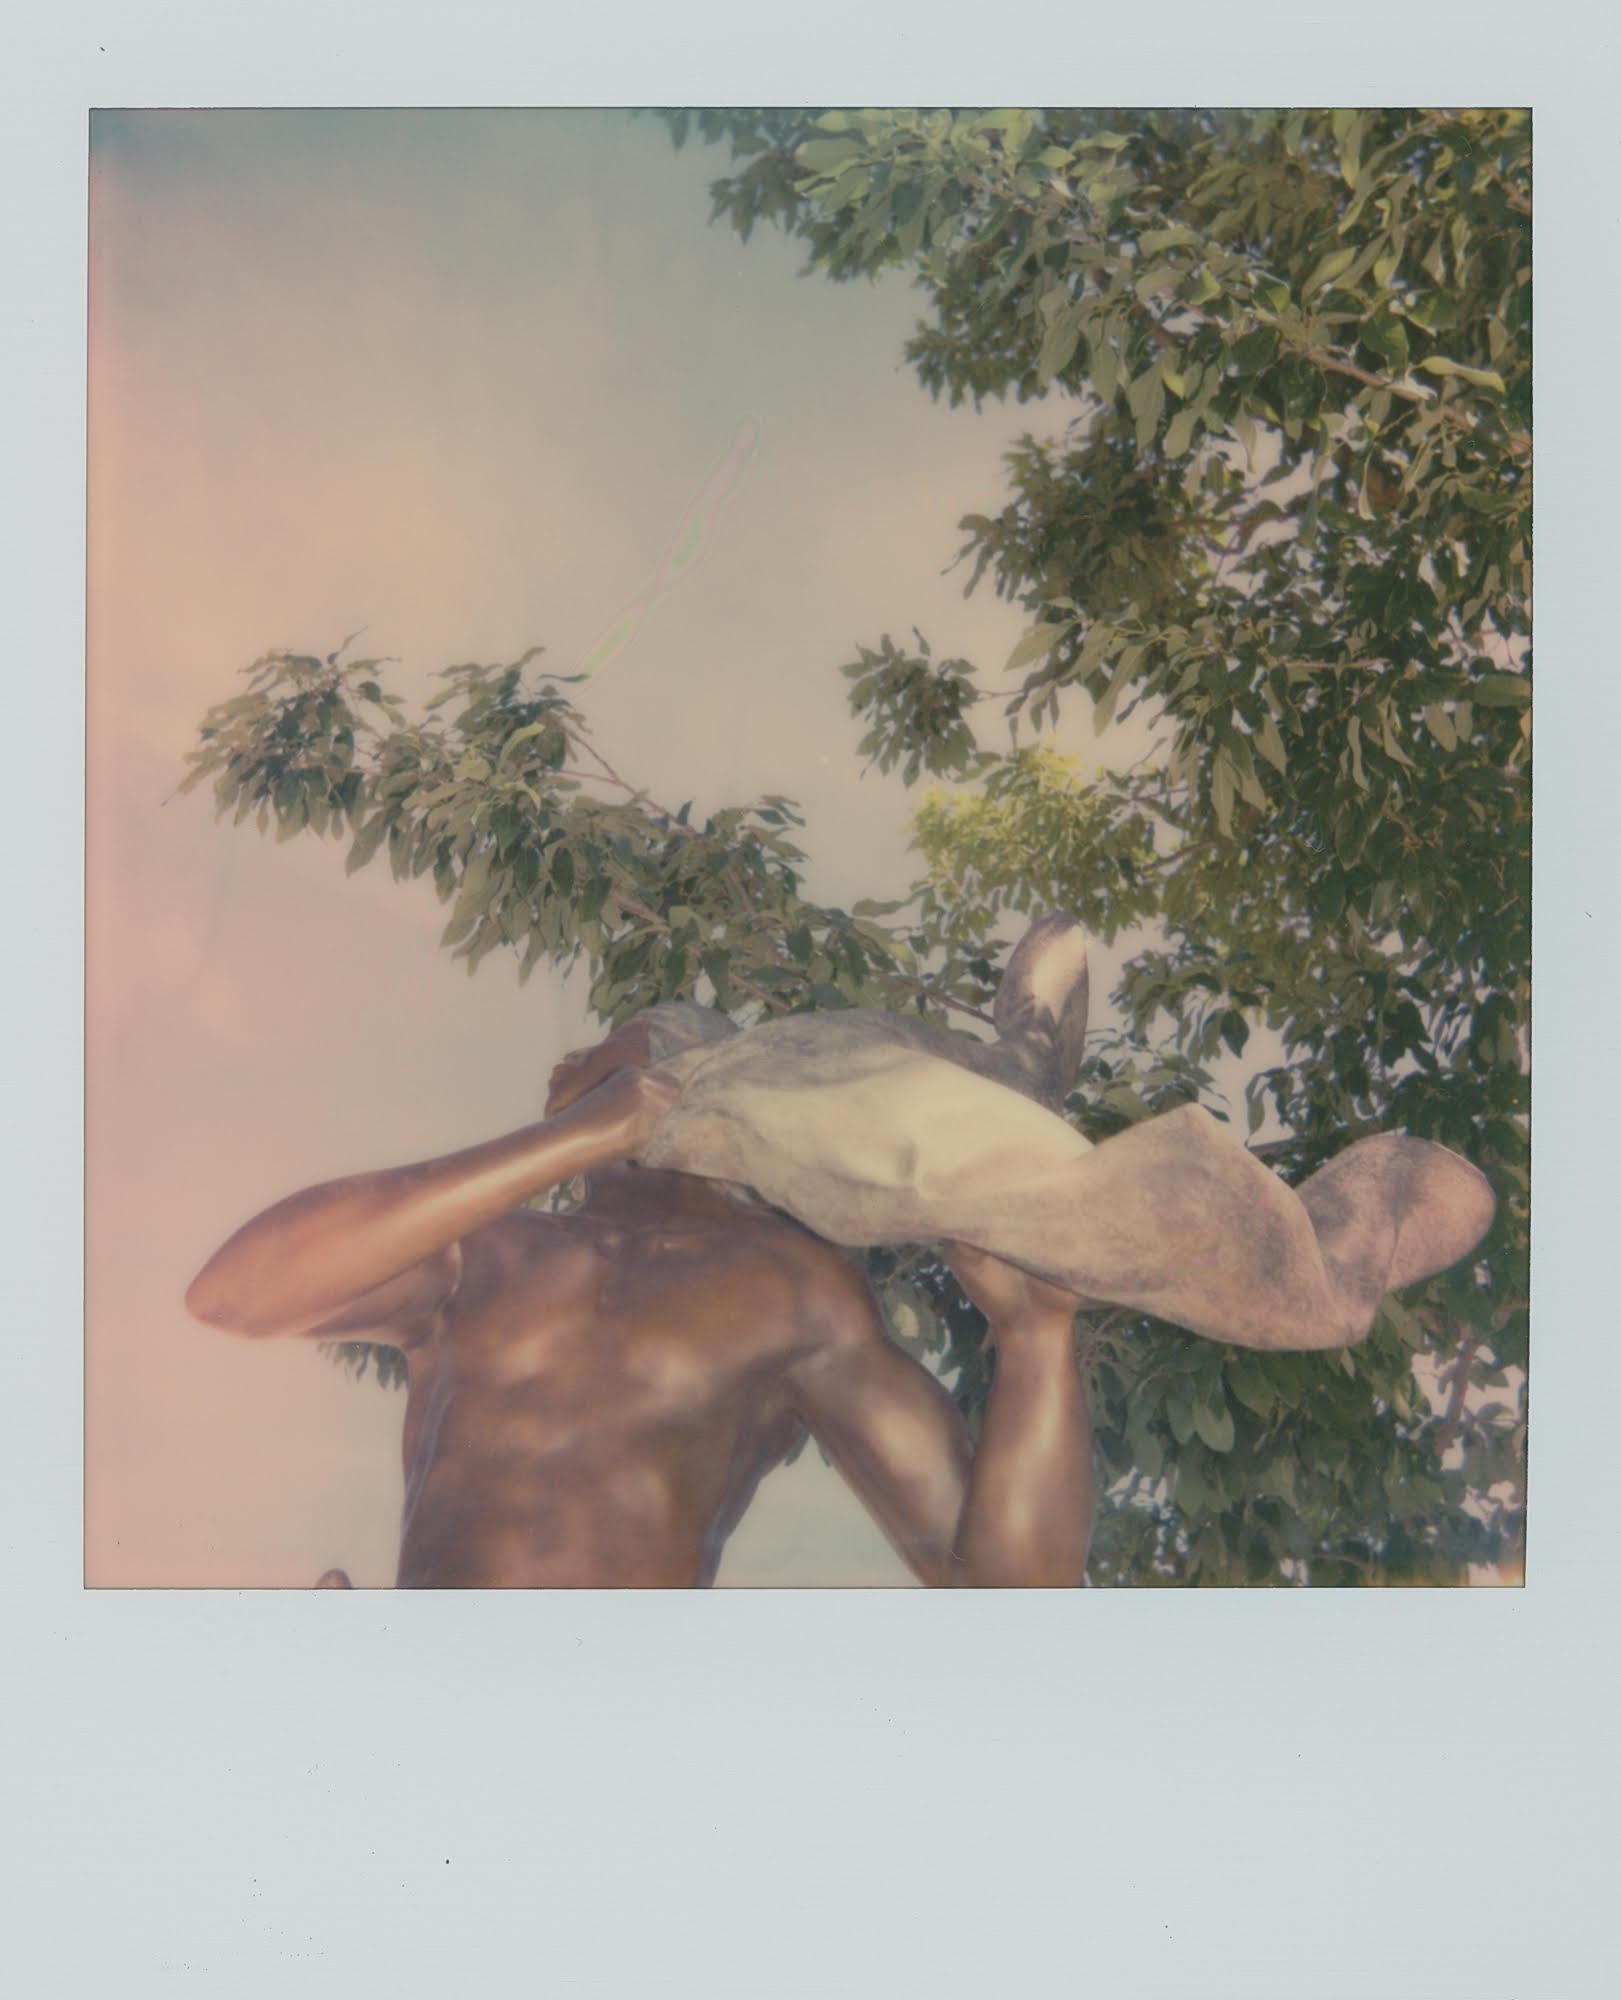 Round Rock TX | Polaroid OneStep 2 | Polaroid Originals Film | Amy Jasek